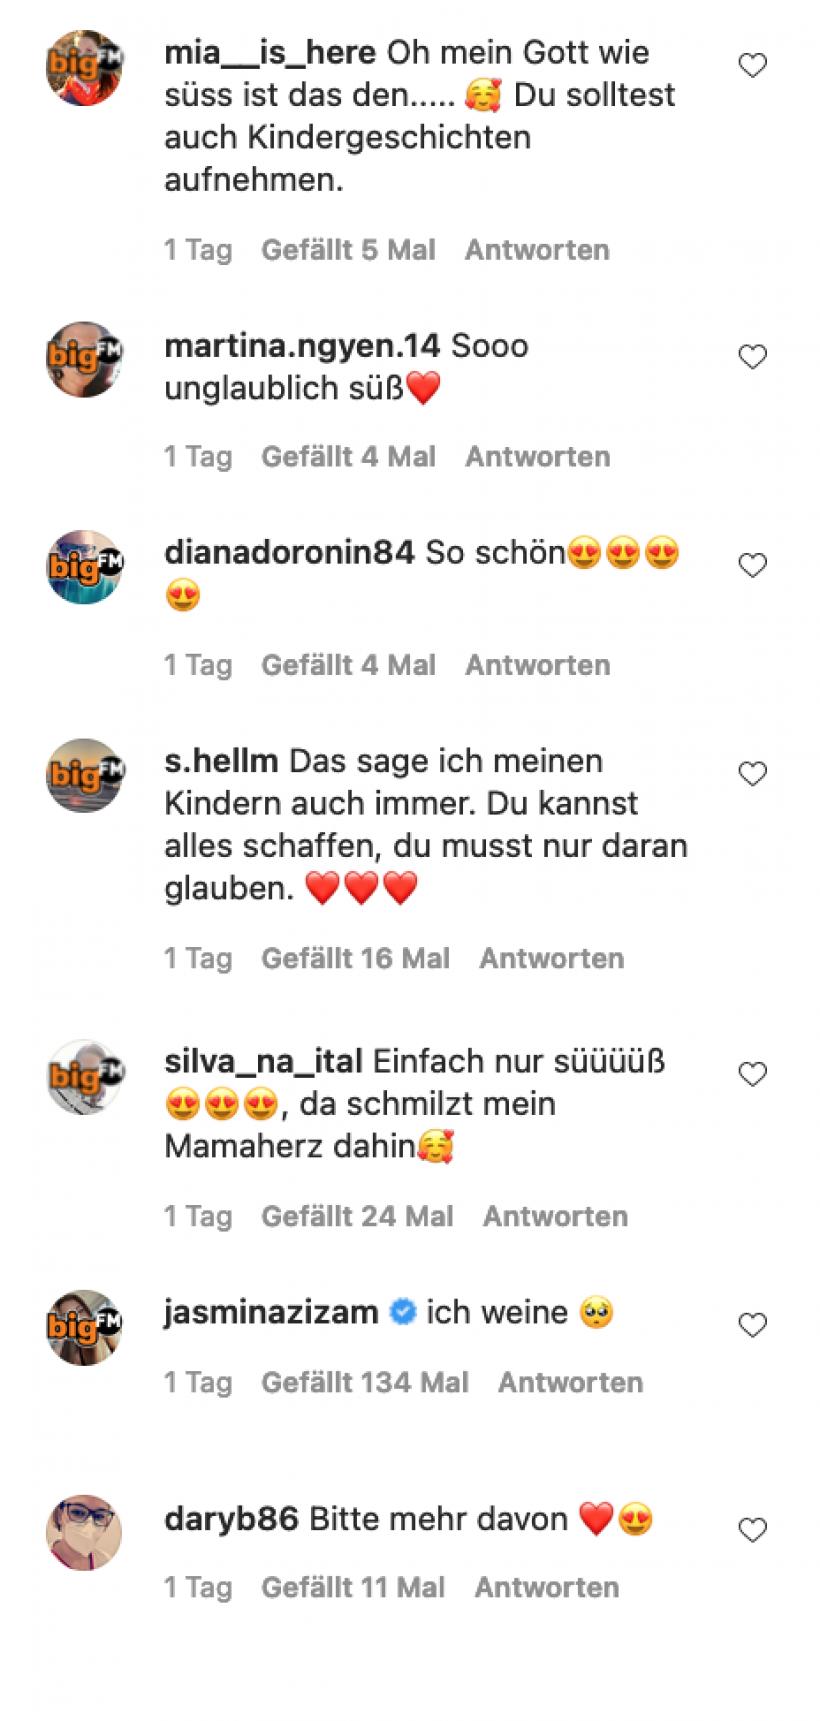 Pietro-Lombardi-Instagram-Story-Kommentarfeld-06.05.2021.png